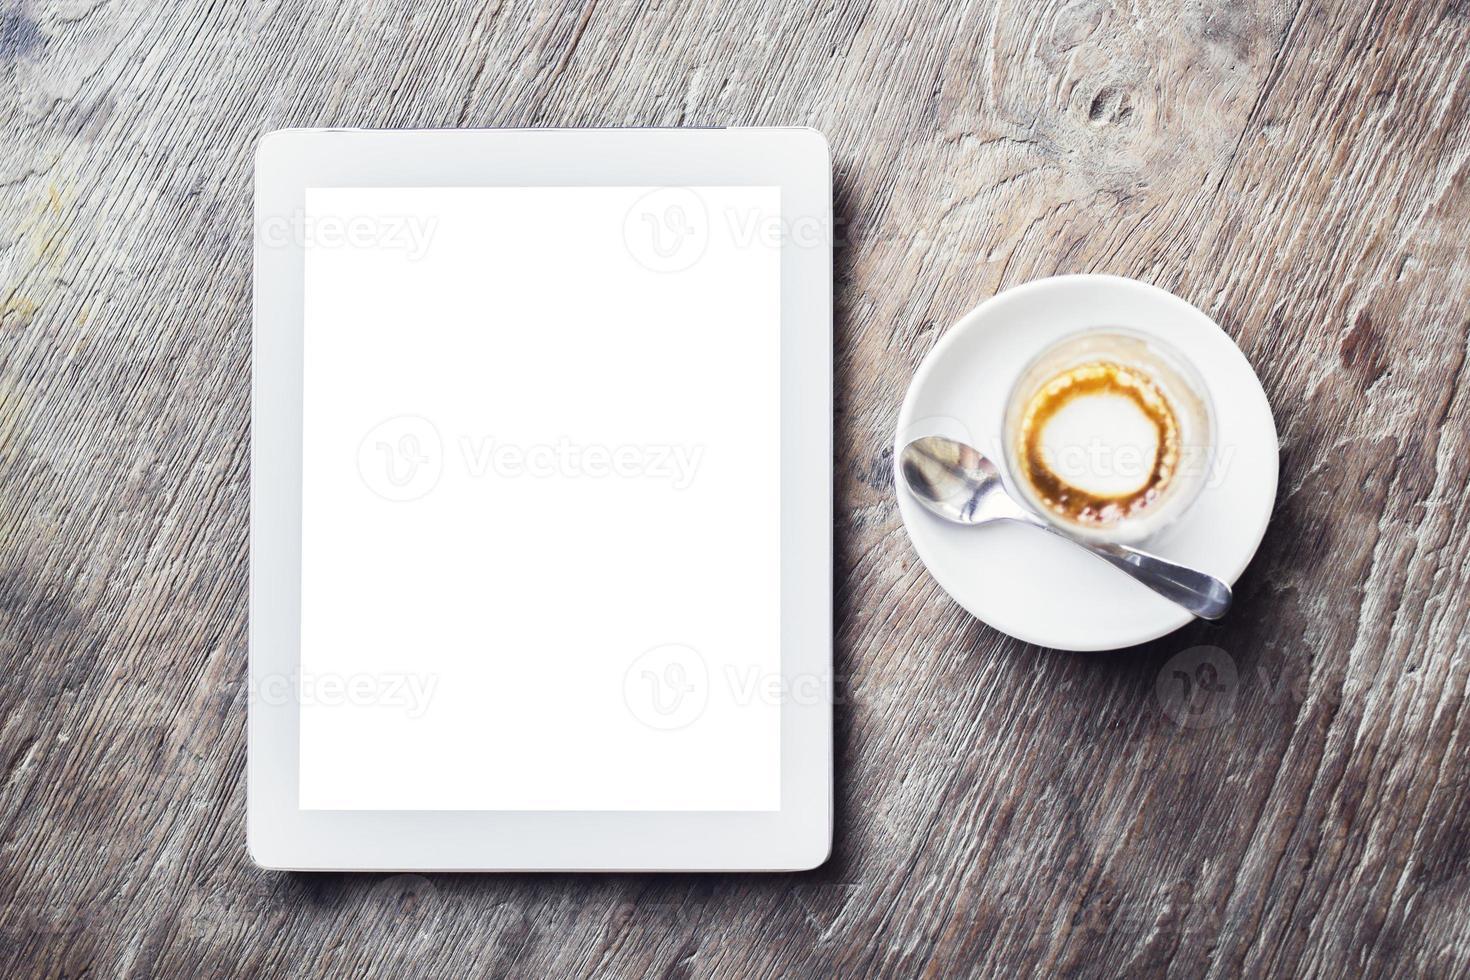 lege digitale tablet met kopje koffie foto